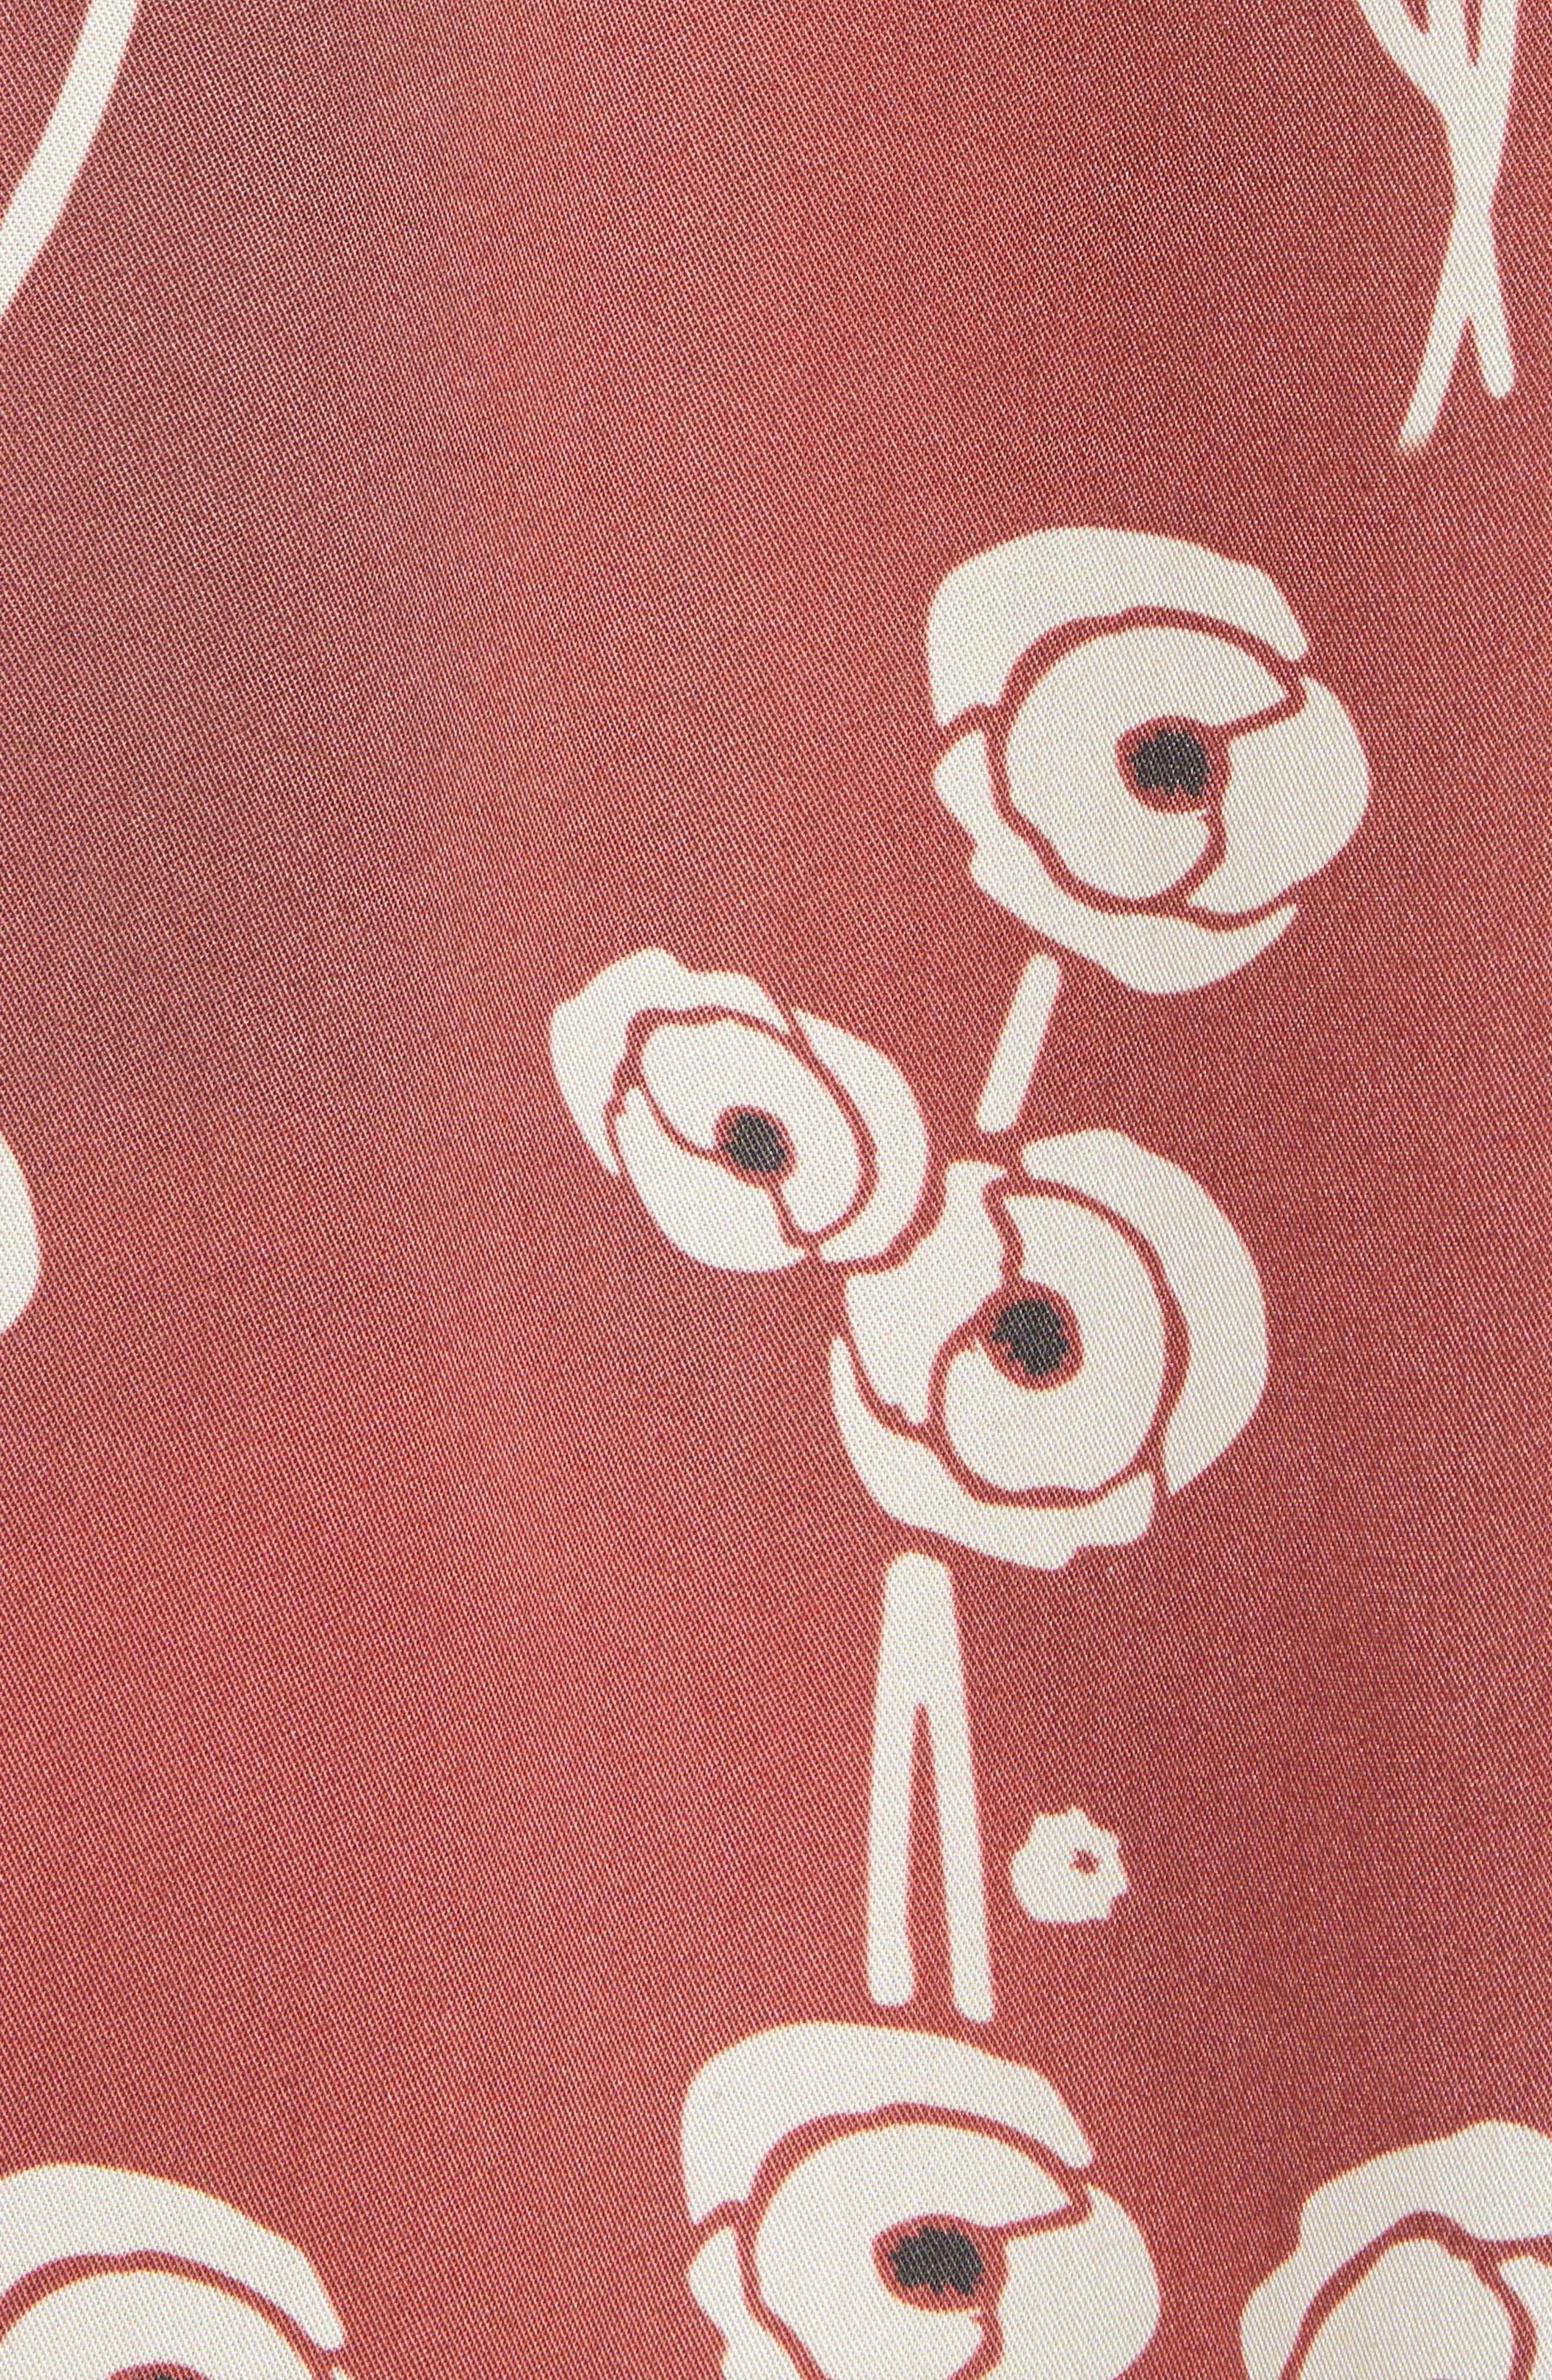 Canty Poppy Woven Shirt,                             Alternate thumbnail 3, color,                             Brick